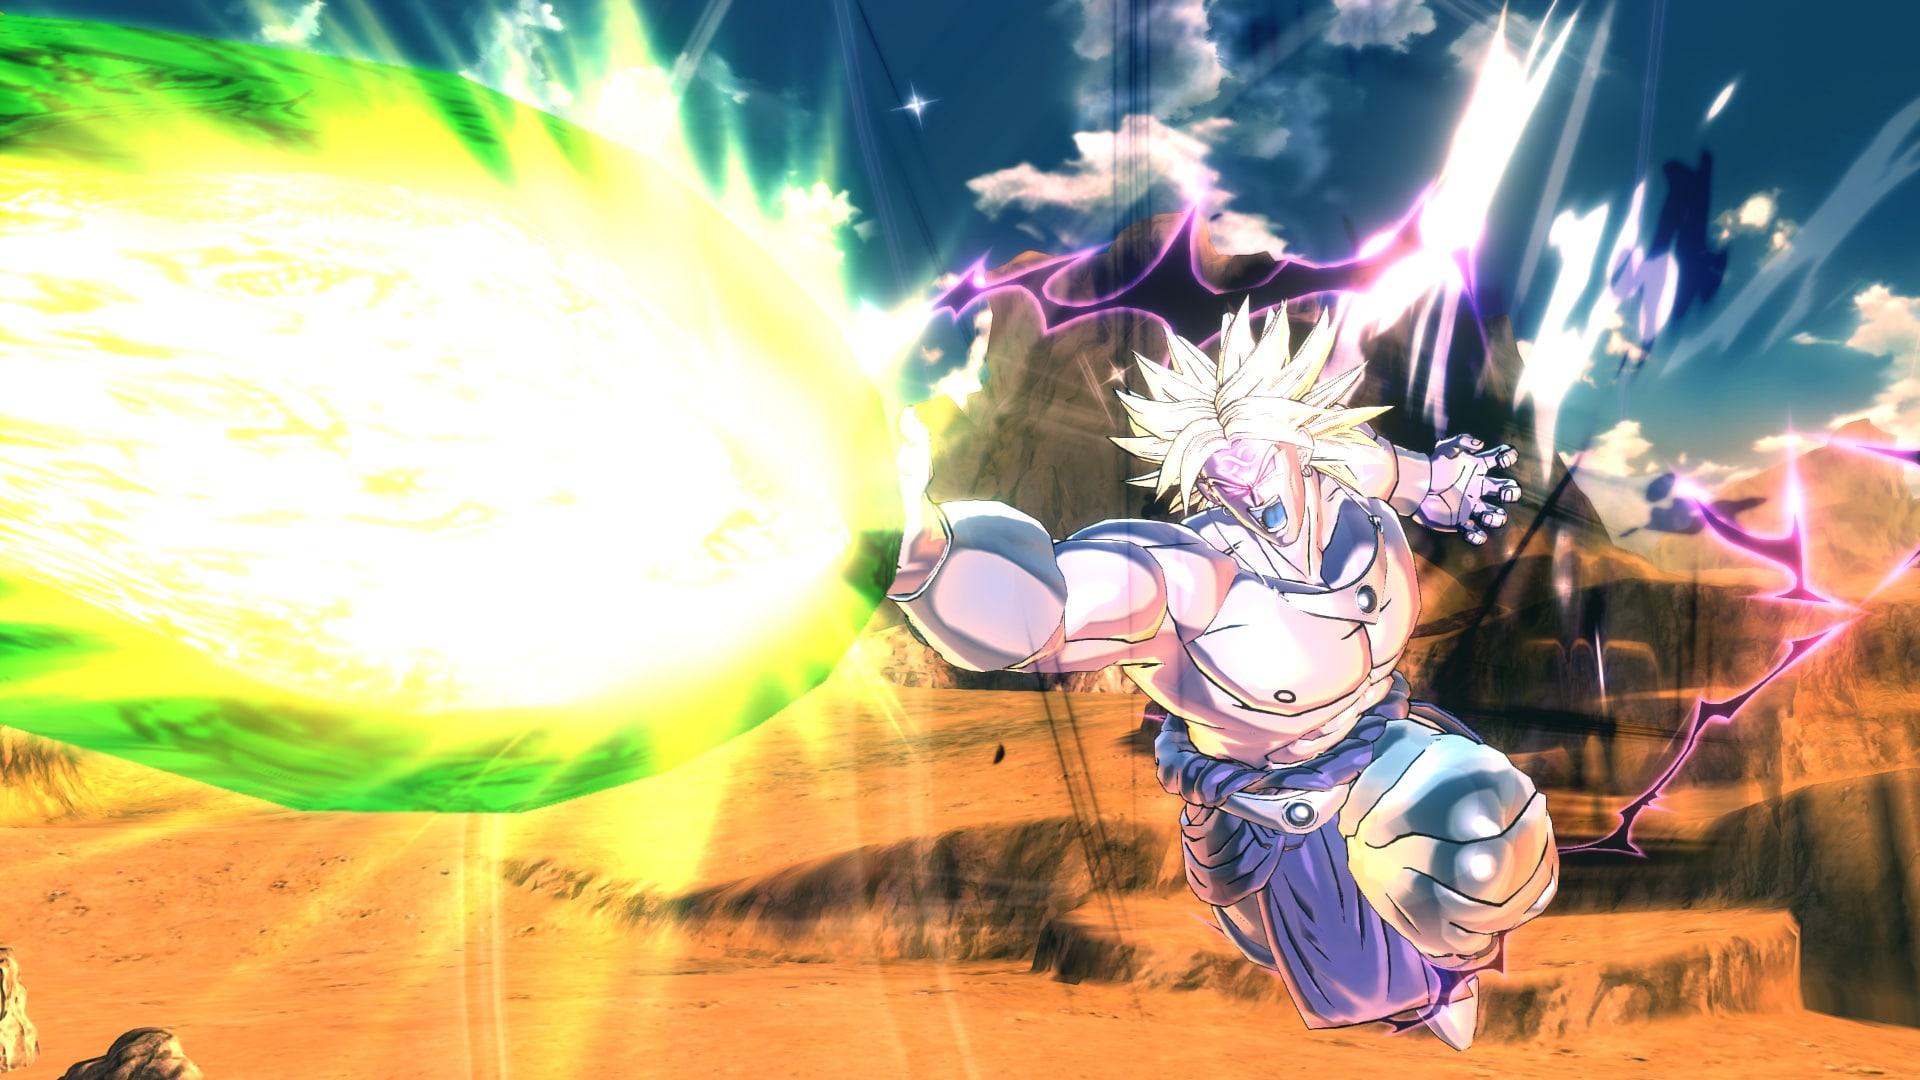 dragon ball raging blast 2 pc key.txt download